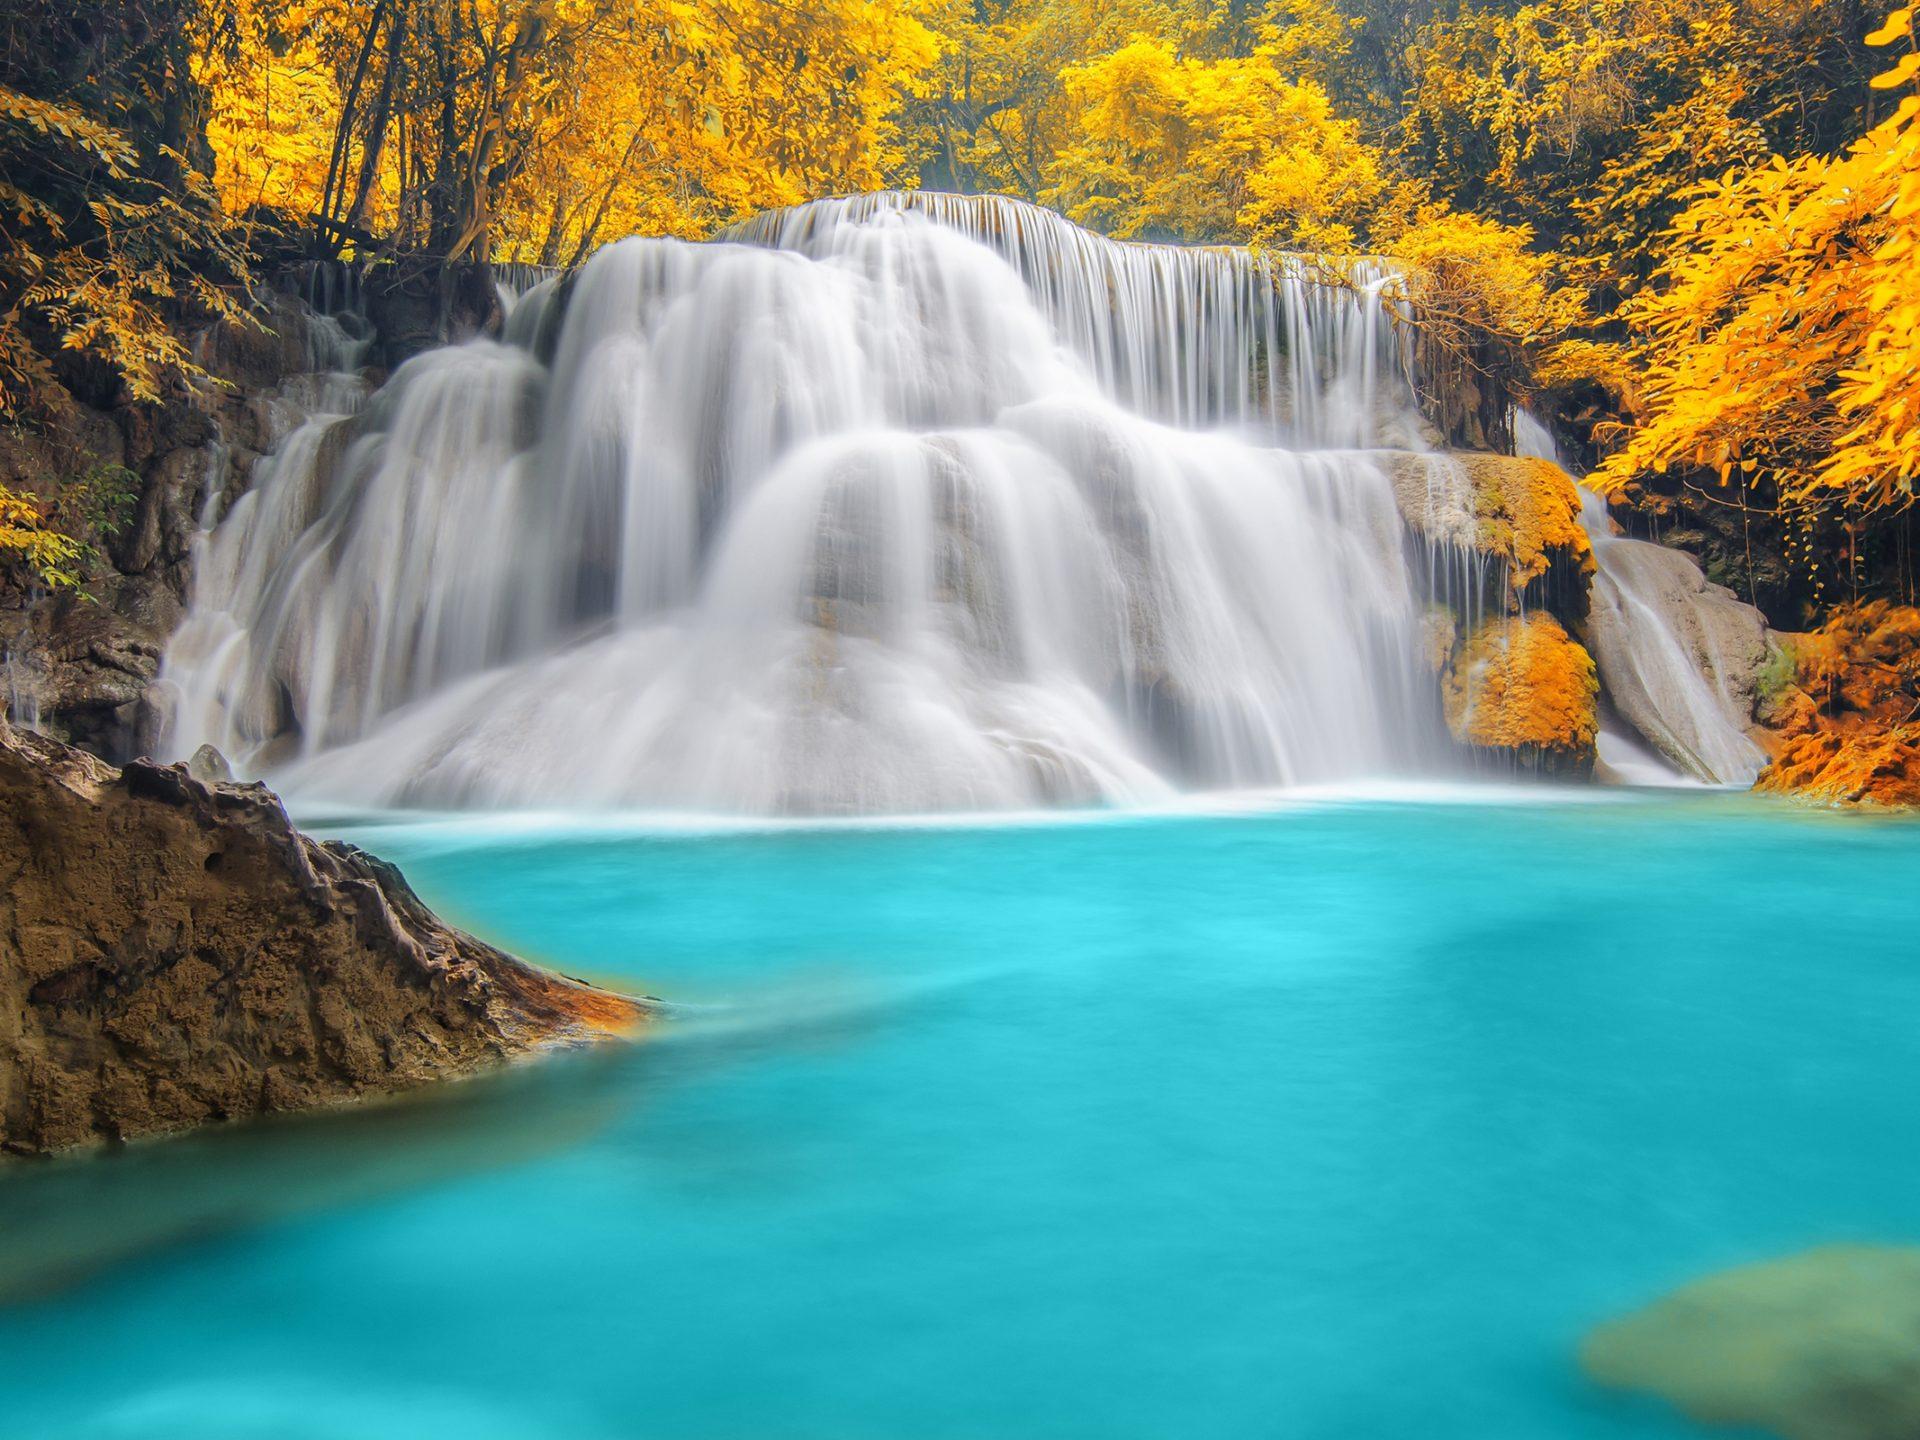 Falls Wallpaper Waterfall Nature Wallpaper Forest Trees River Waterfall Blue Water